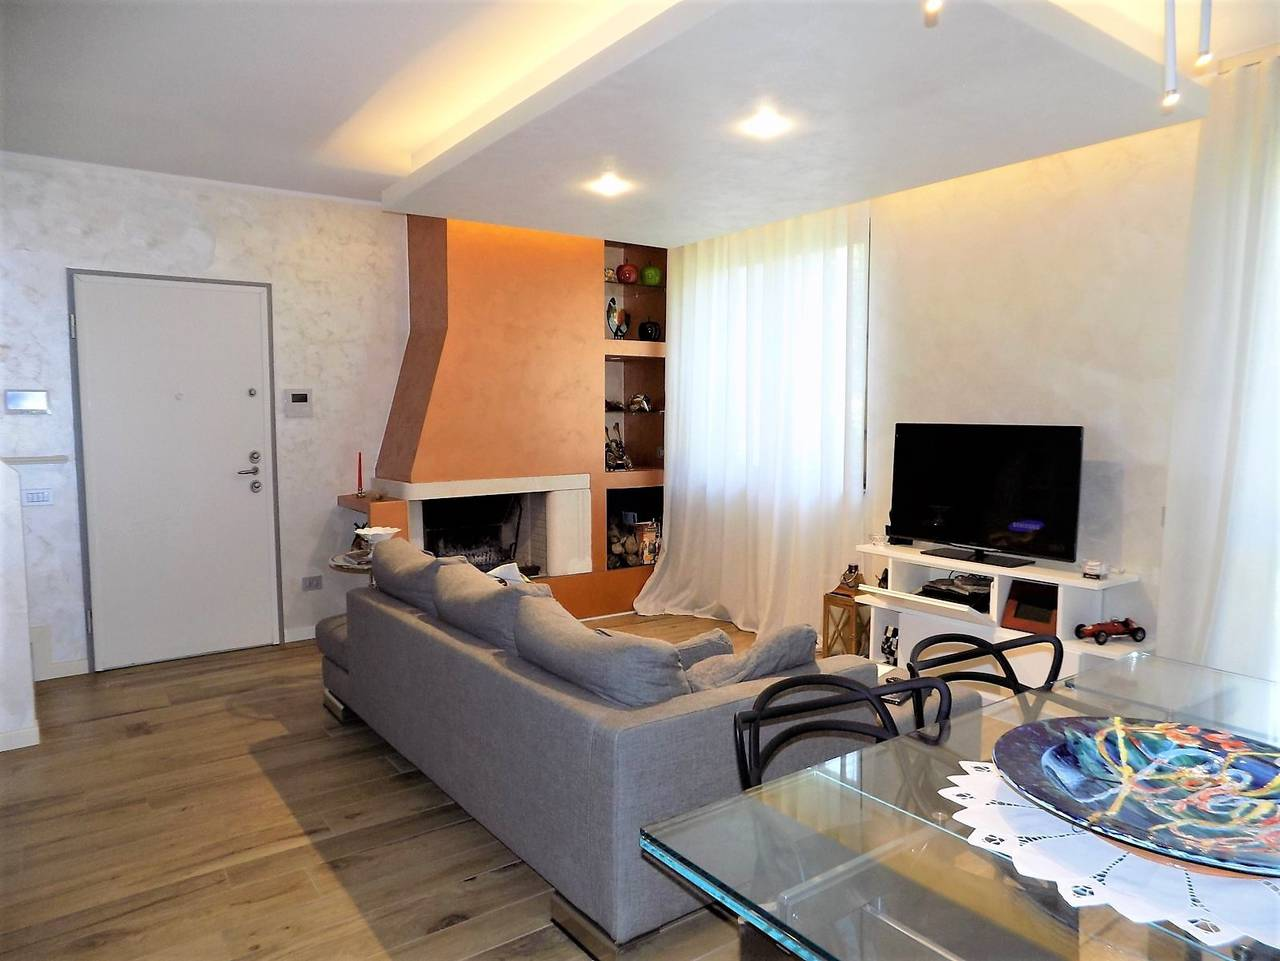 Porzione-villa-bifamigliare-ristrutturata-in-vendita-a-Carnate-7